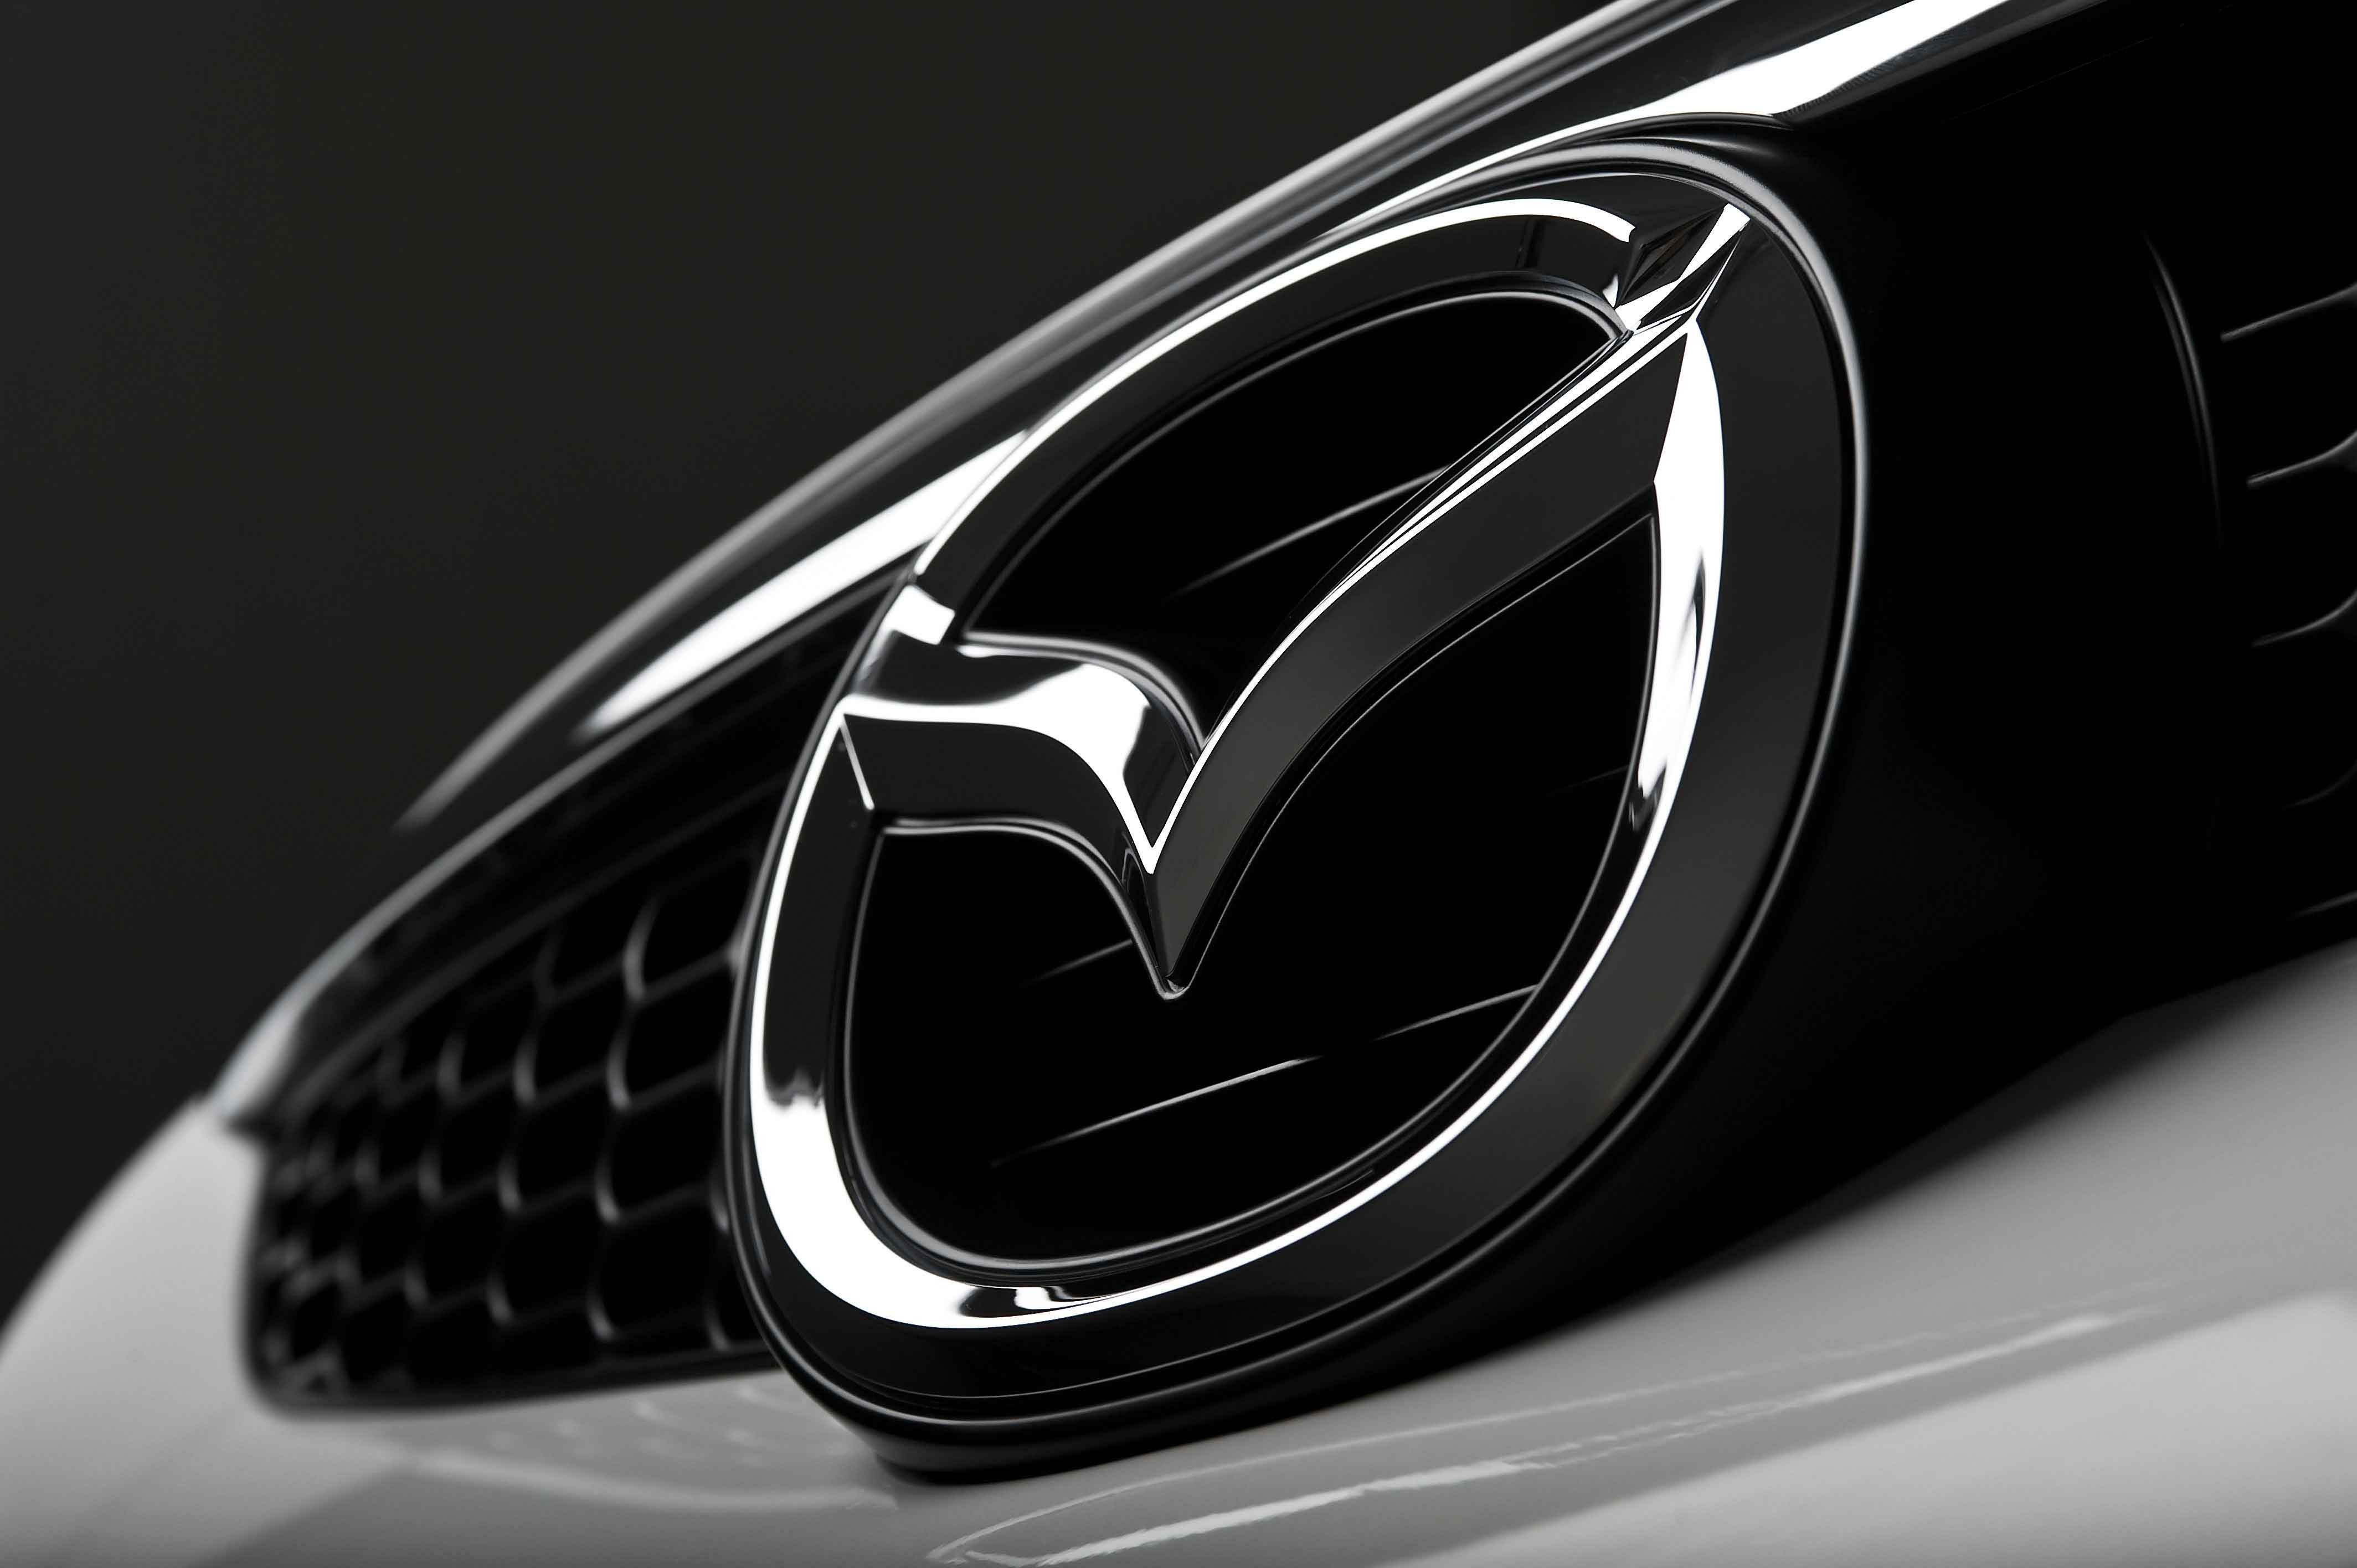 Mazda, Logo, Wide, Hd, Wallpaper, Download, Wide, Beauty, - Mazda Logo On Car , HD Wallpaper & Backgrounds